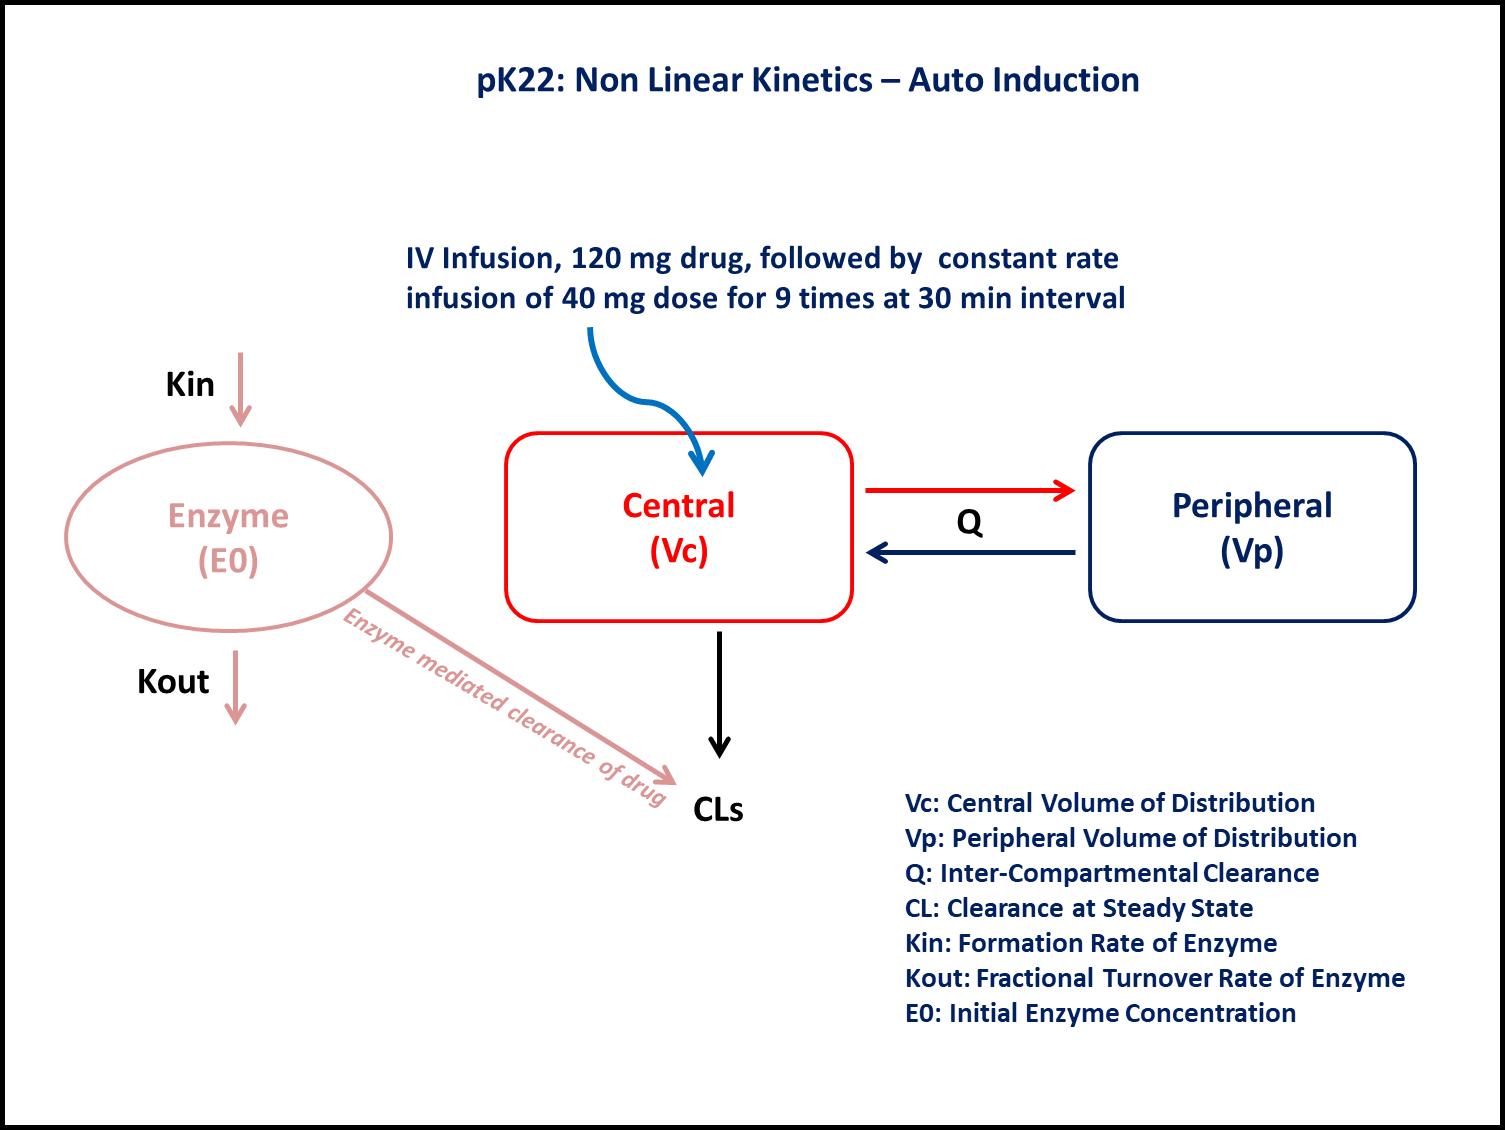 PK22 Graphic Model